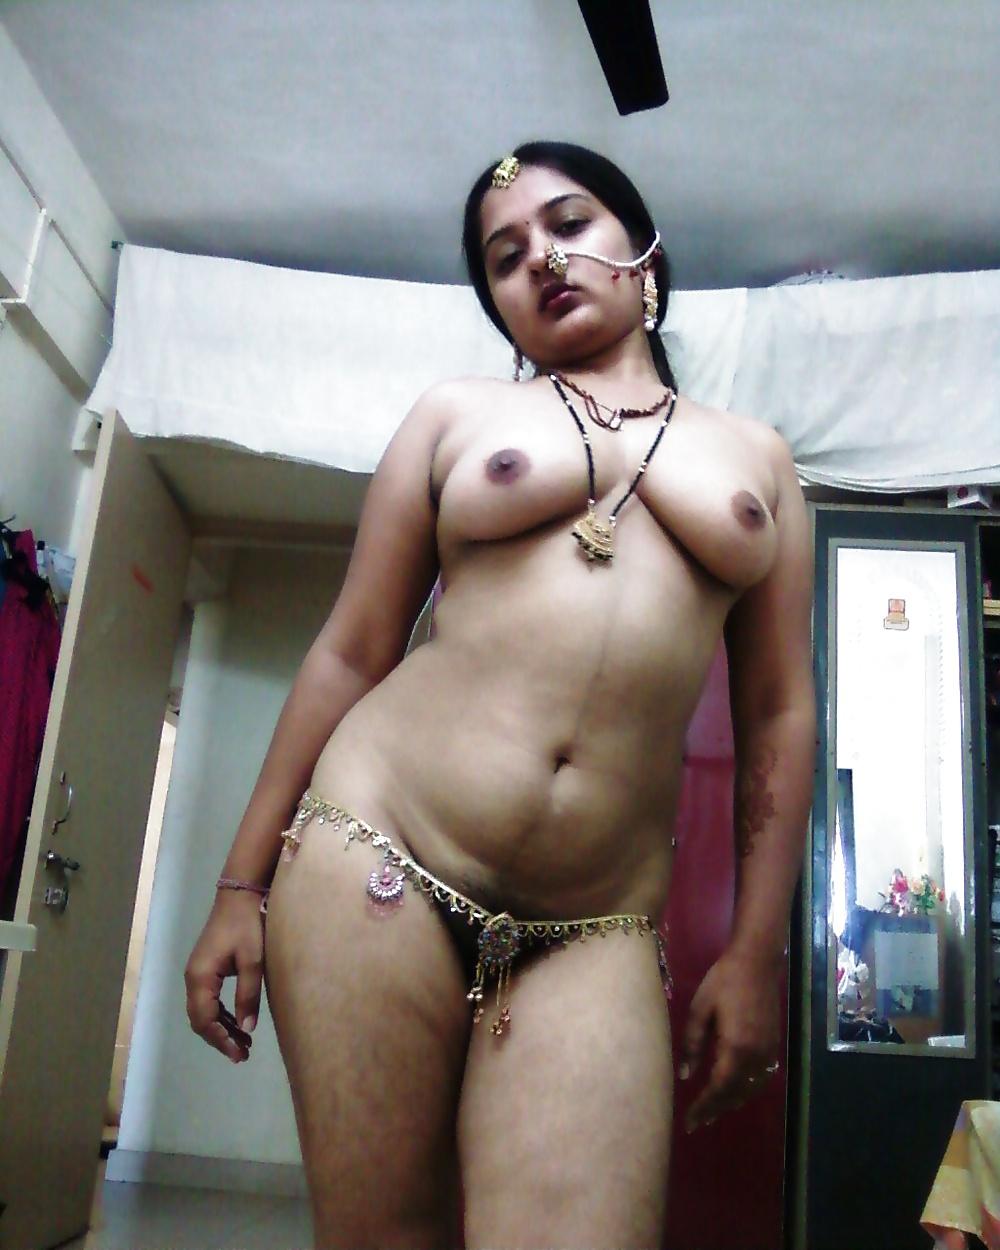 boobs-hilary-sex-arabian-nude-bhabhi-jungle-sperm-taste